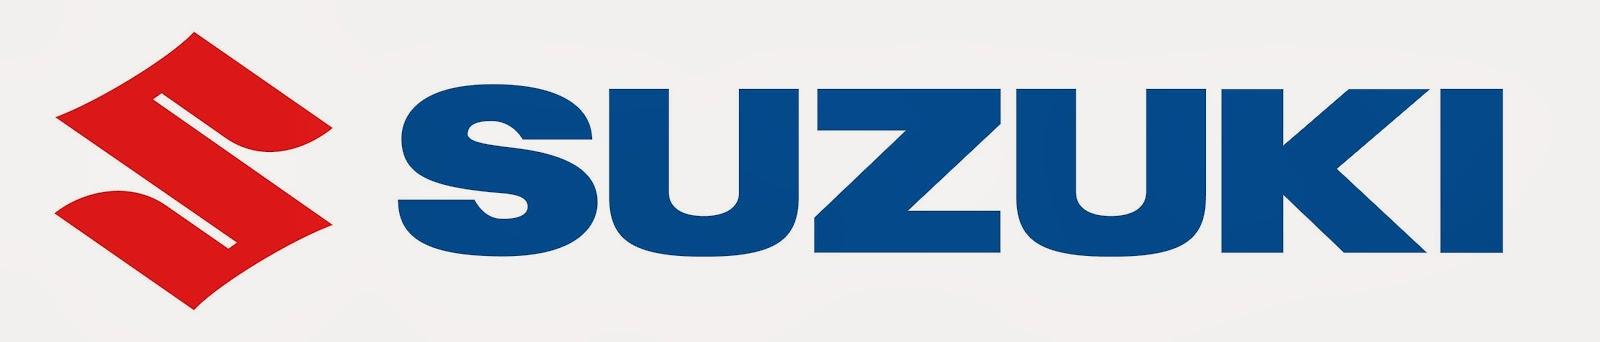 Daftar Harga Motor Suzuki Terbaru